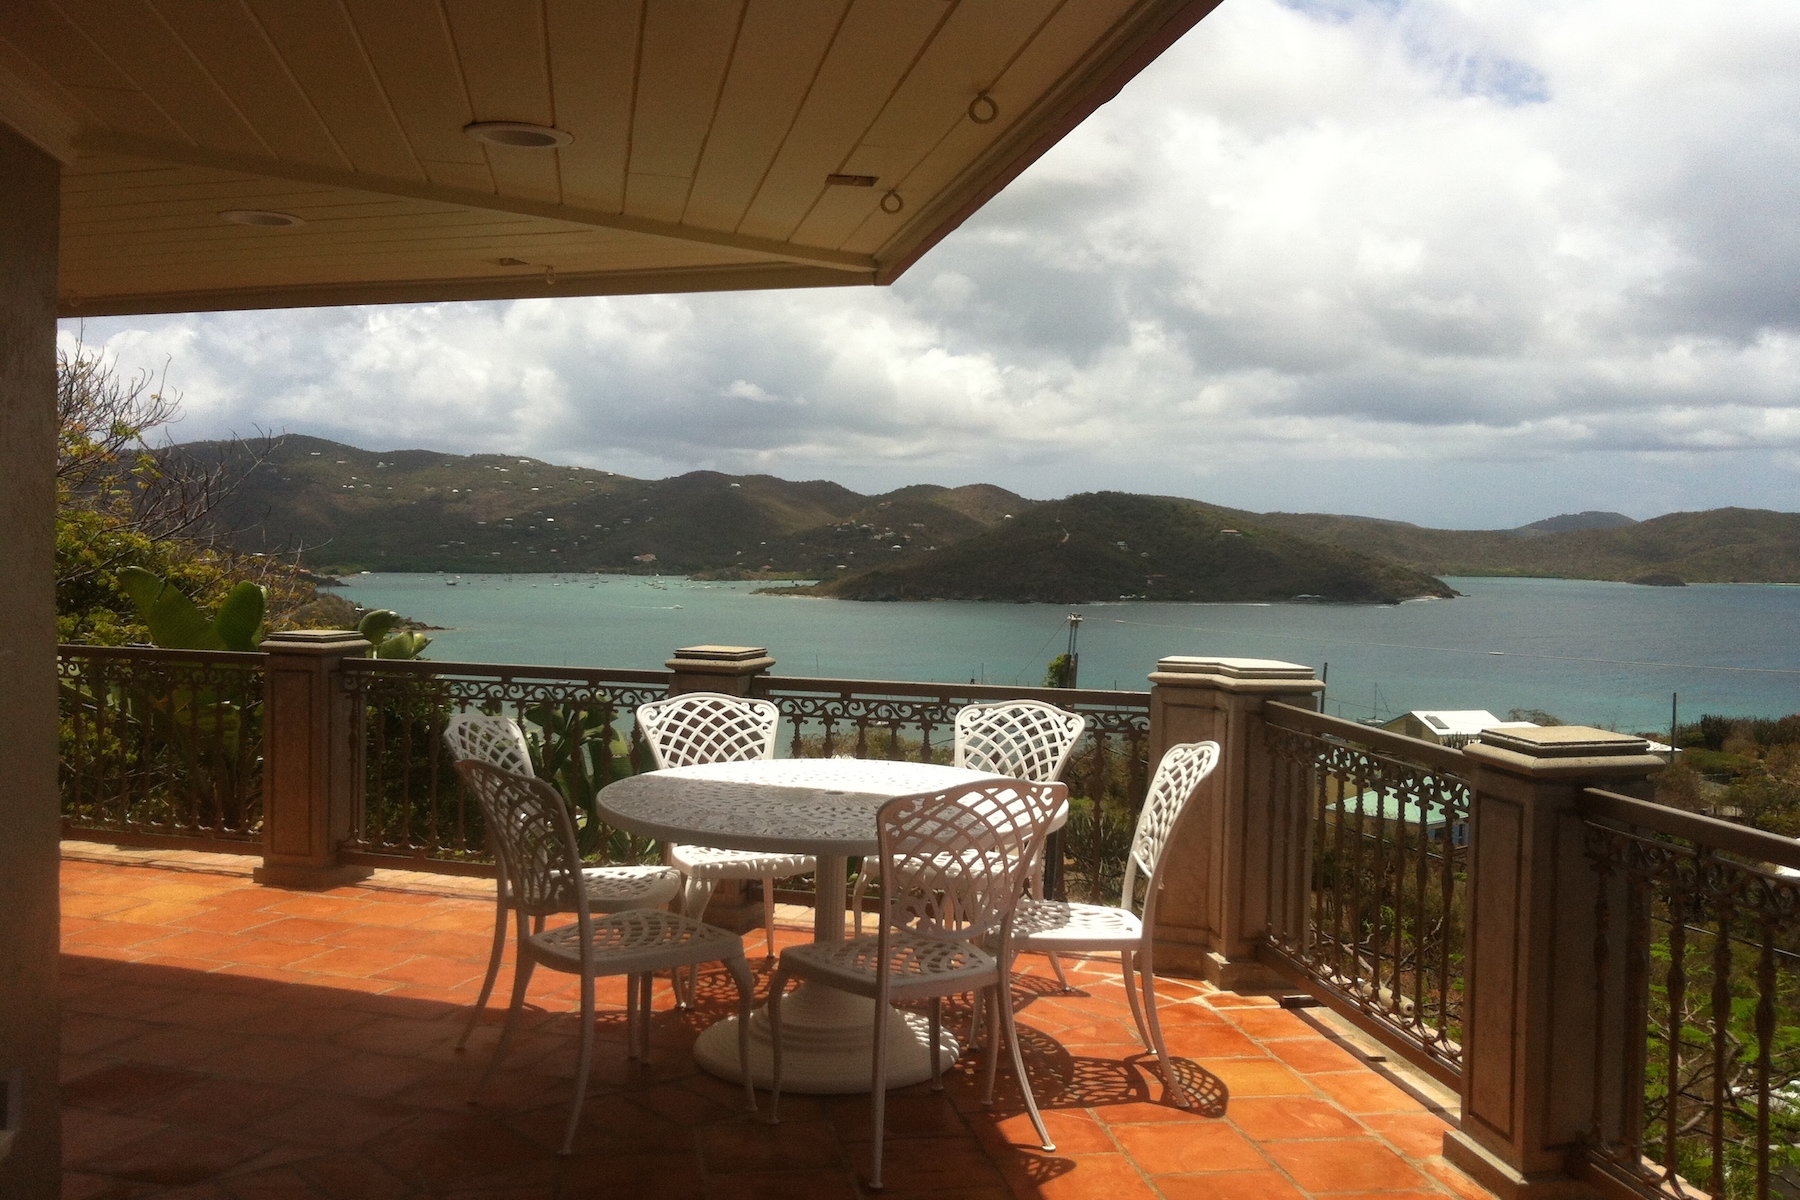 Single Family Home for Sale at Villa Agel 6B 21 St. Quaco & Zimmerman St John, Virgin Islands 00830 United States Virgin Islands